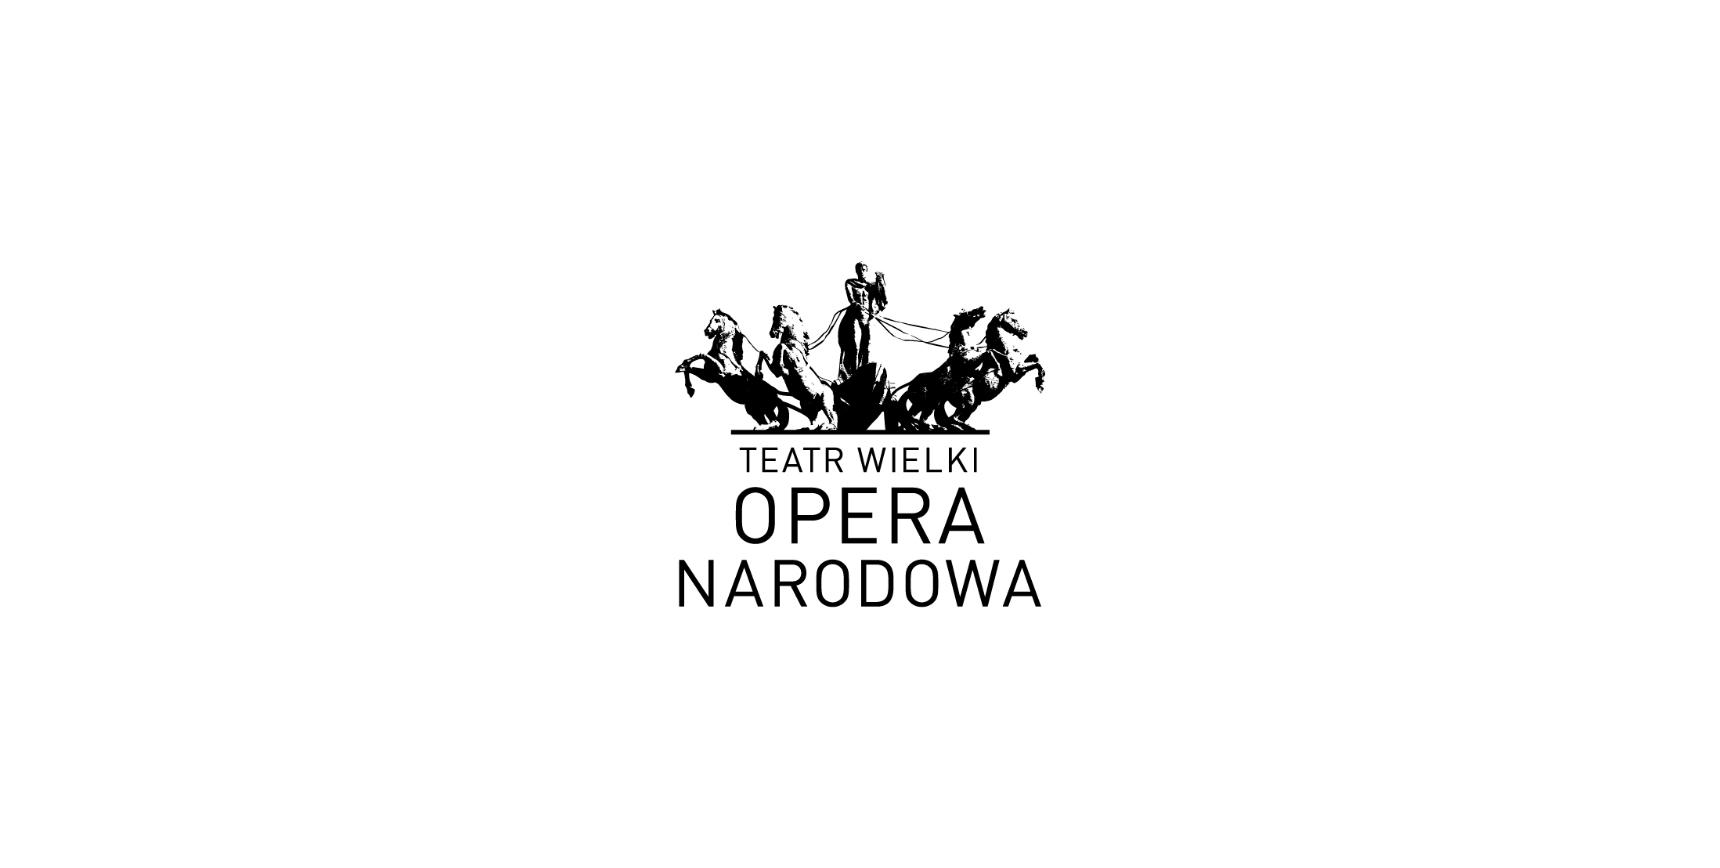 Polish National Opera announces season 21/22